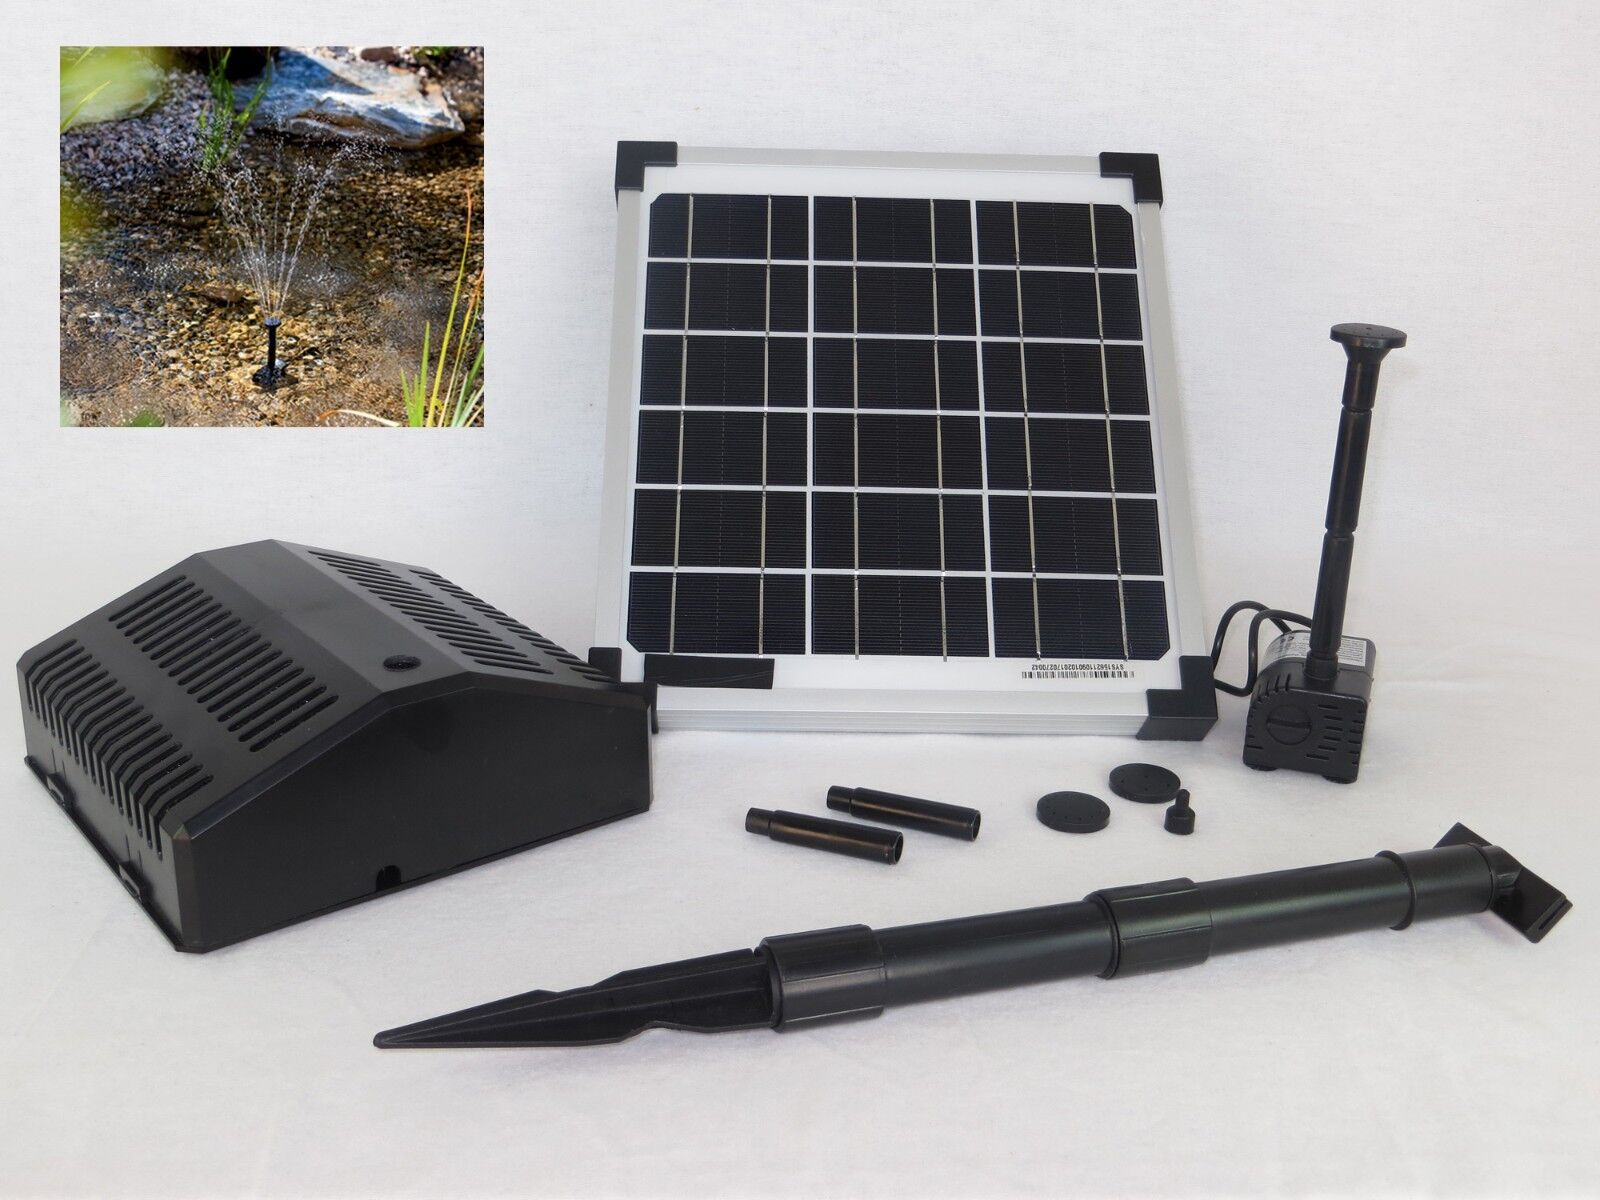 10 W Solarpumpe Filter Teichpumpe  Solar Garten Teich Pumpe Springbrunnen Teiche